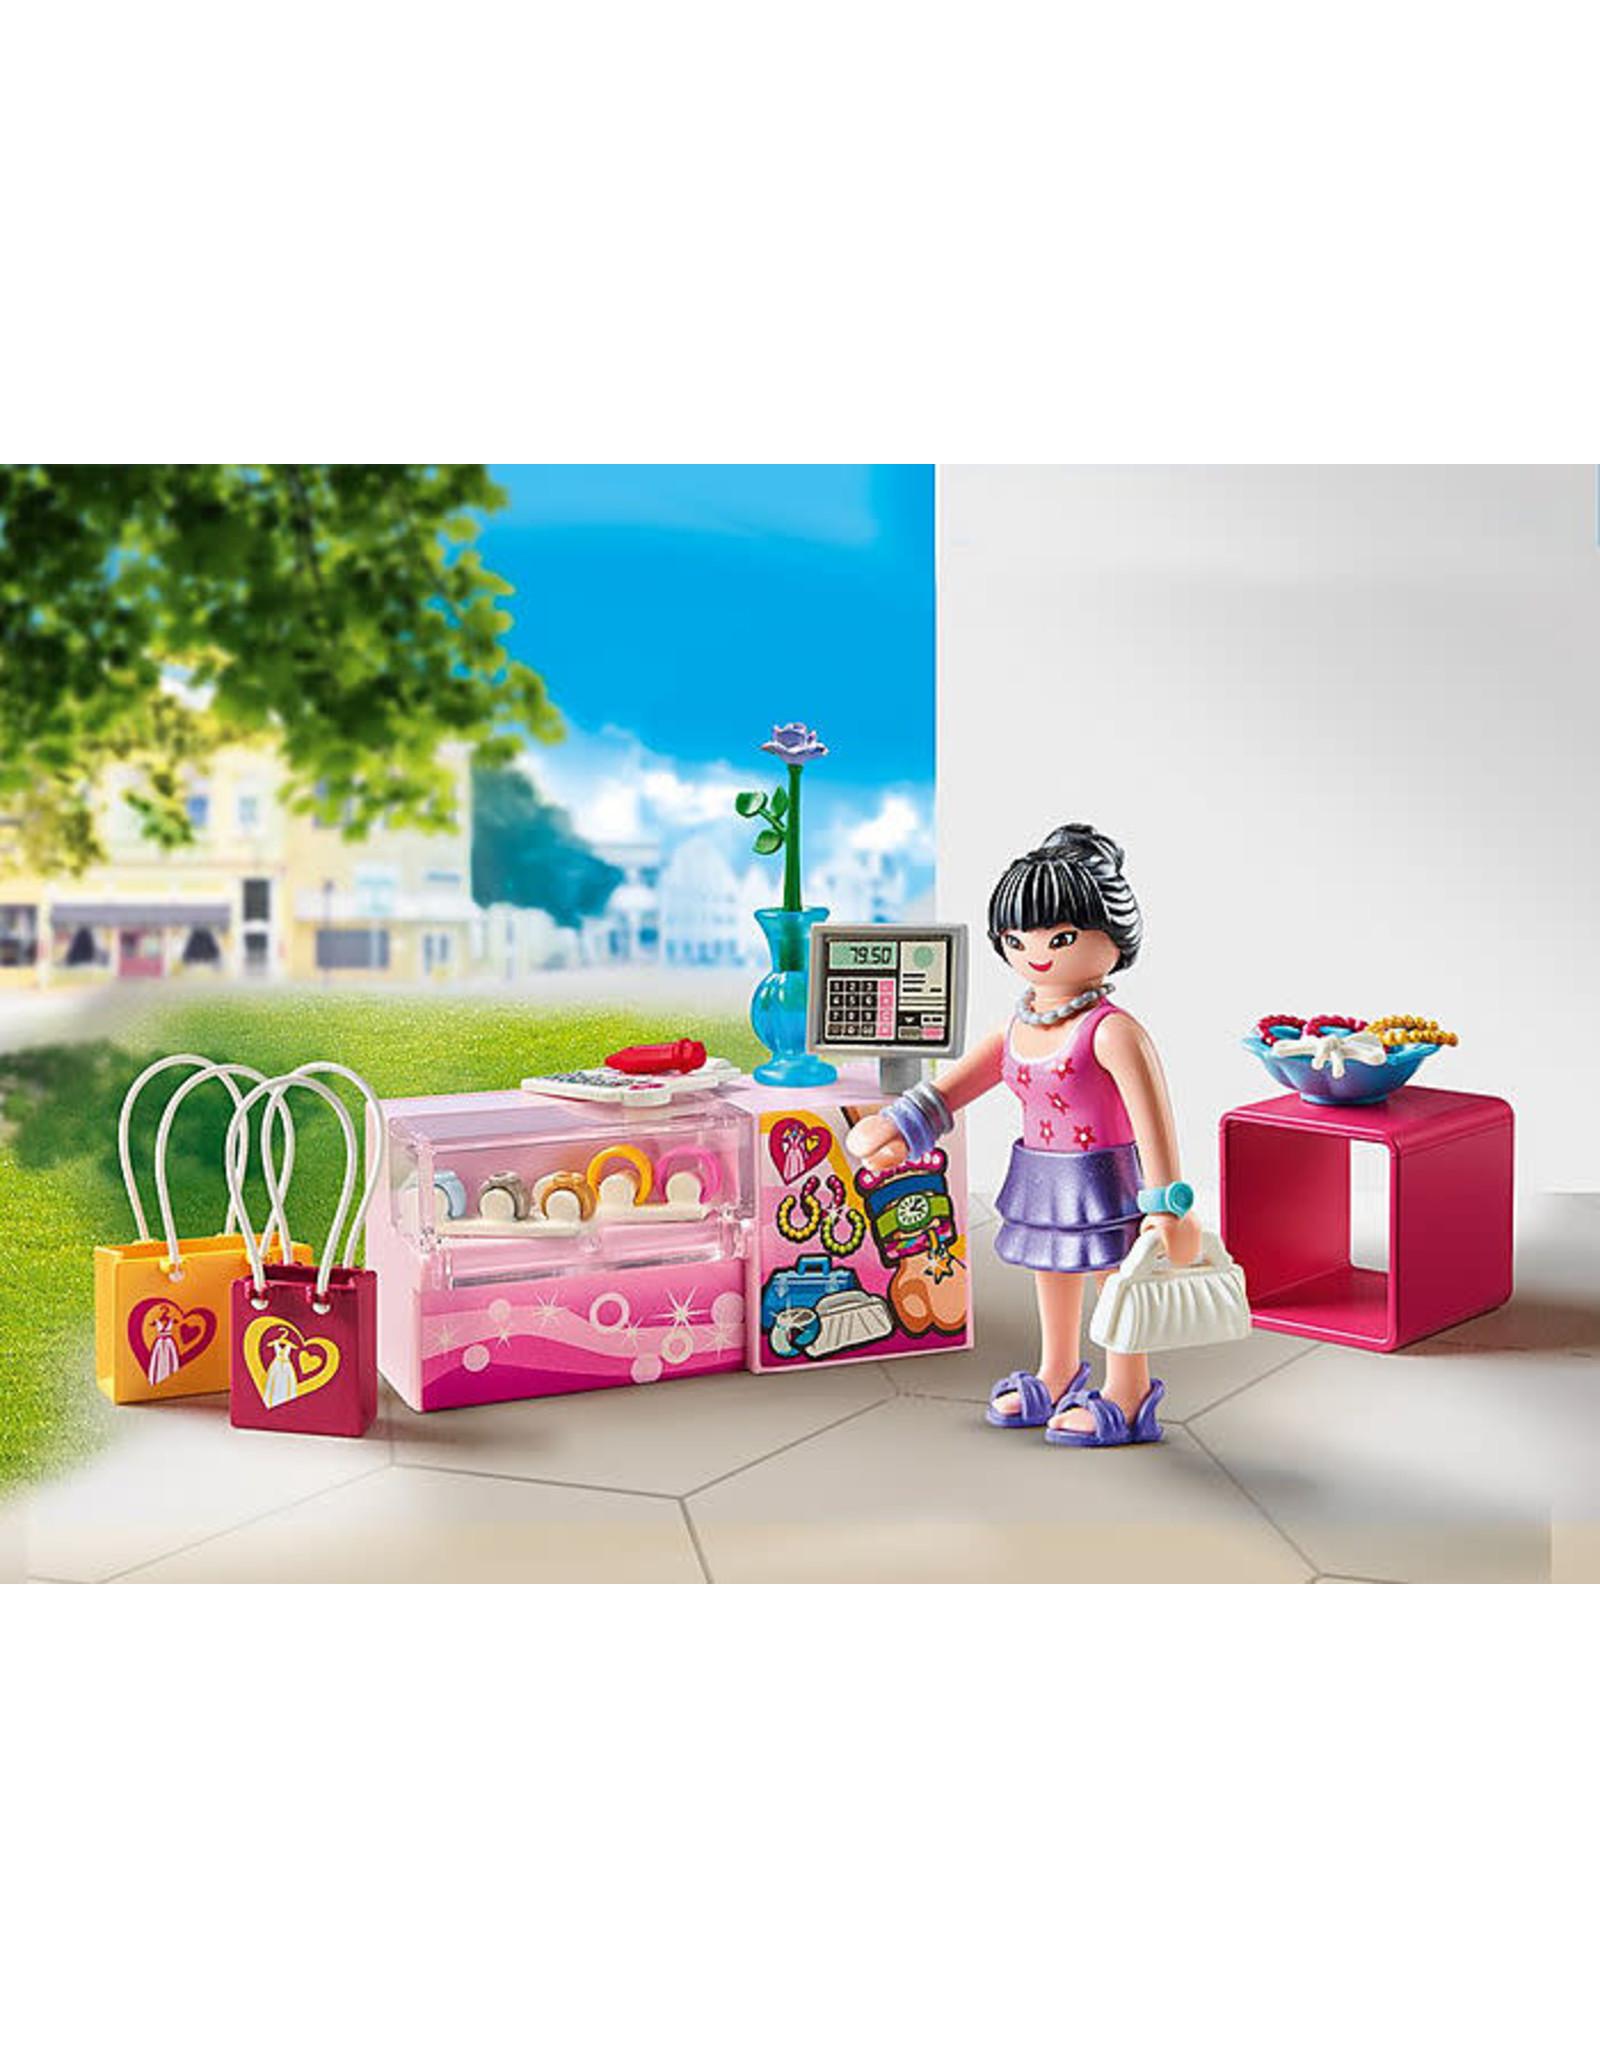 Playmobil Fashion Accessories